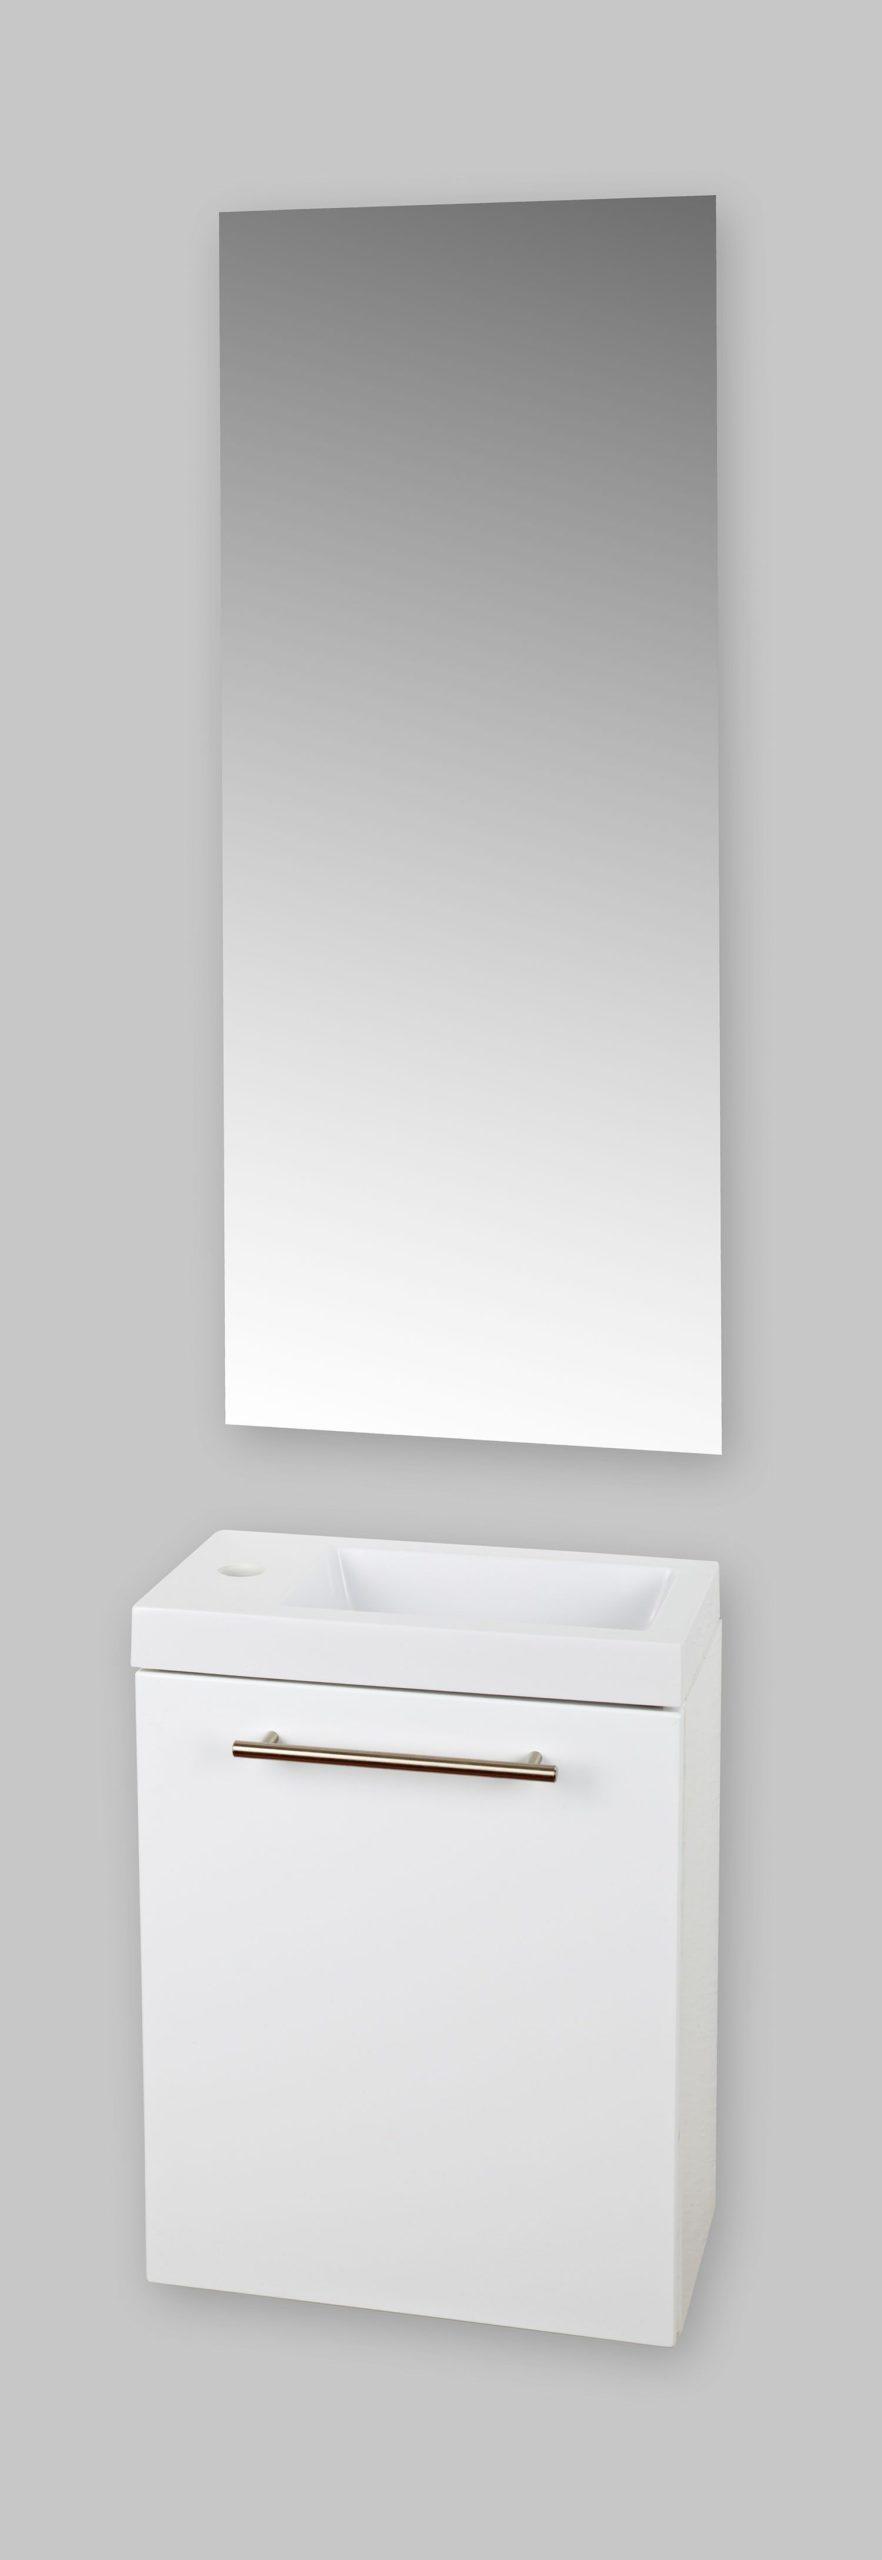 Badstuber Fantasy toiletmeubel hoogglans wit 40x22cm